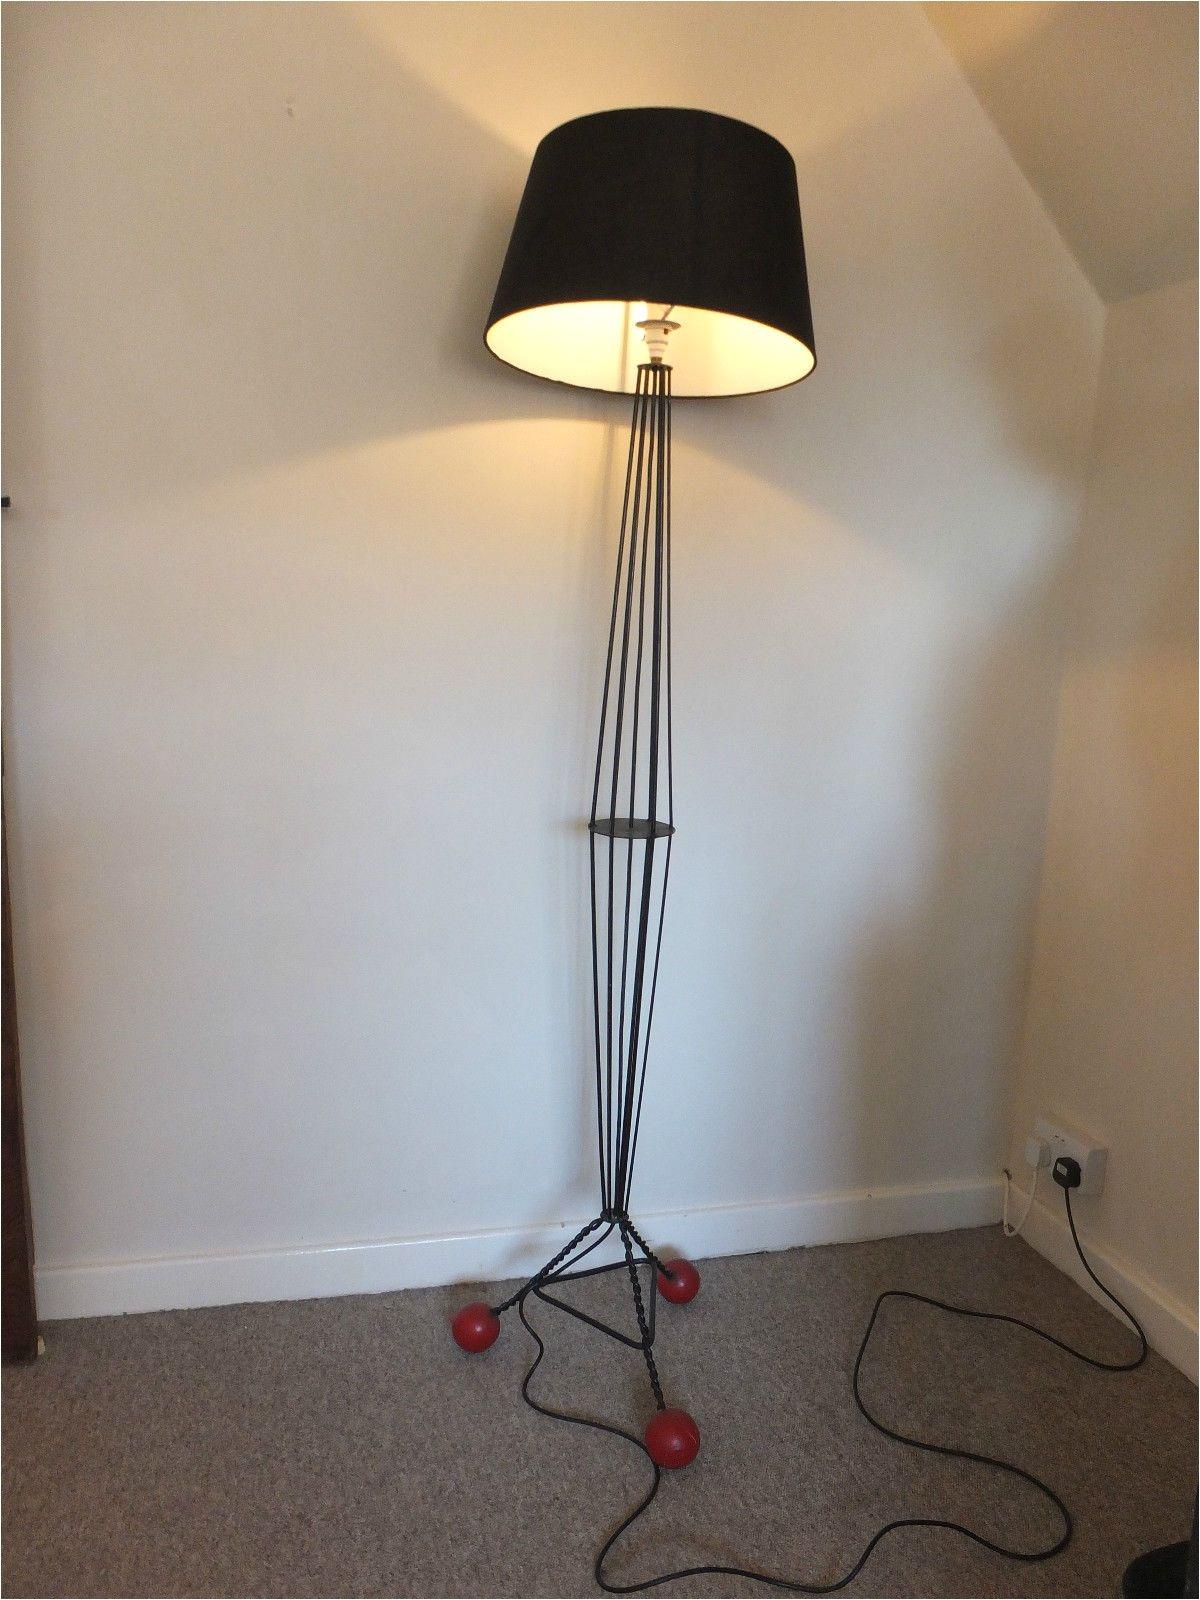 Photographer S TriPod Floor Lamp Ebay Rare Vintage Retro Standard Floor Lamp Sputnik Skylon 1950 1960s